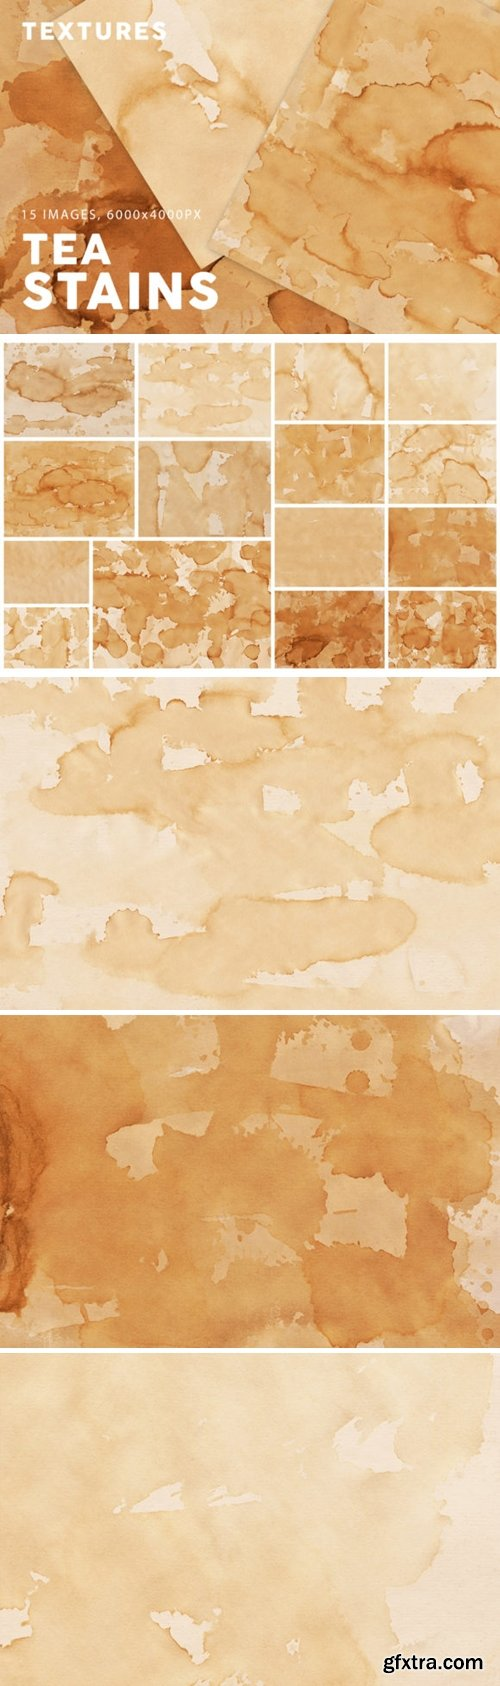 15 Tea Stain Paper Textures 1958644